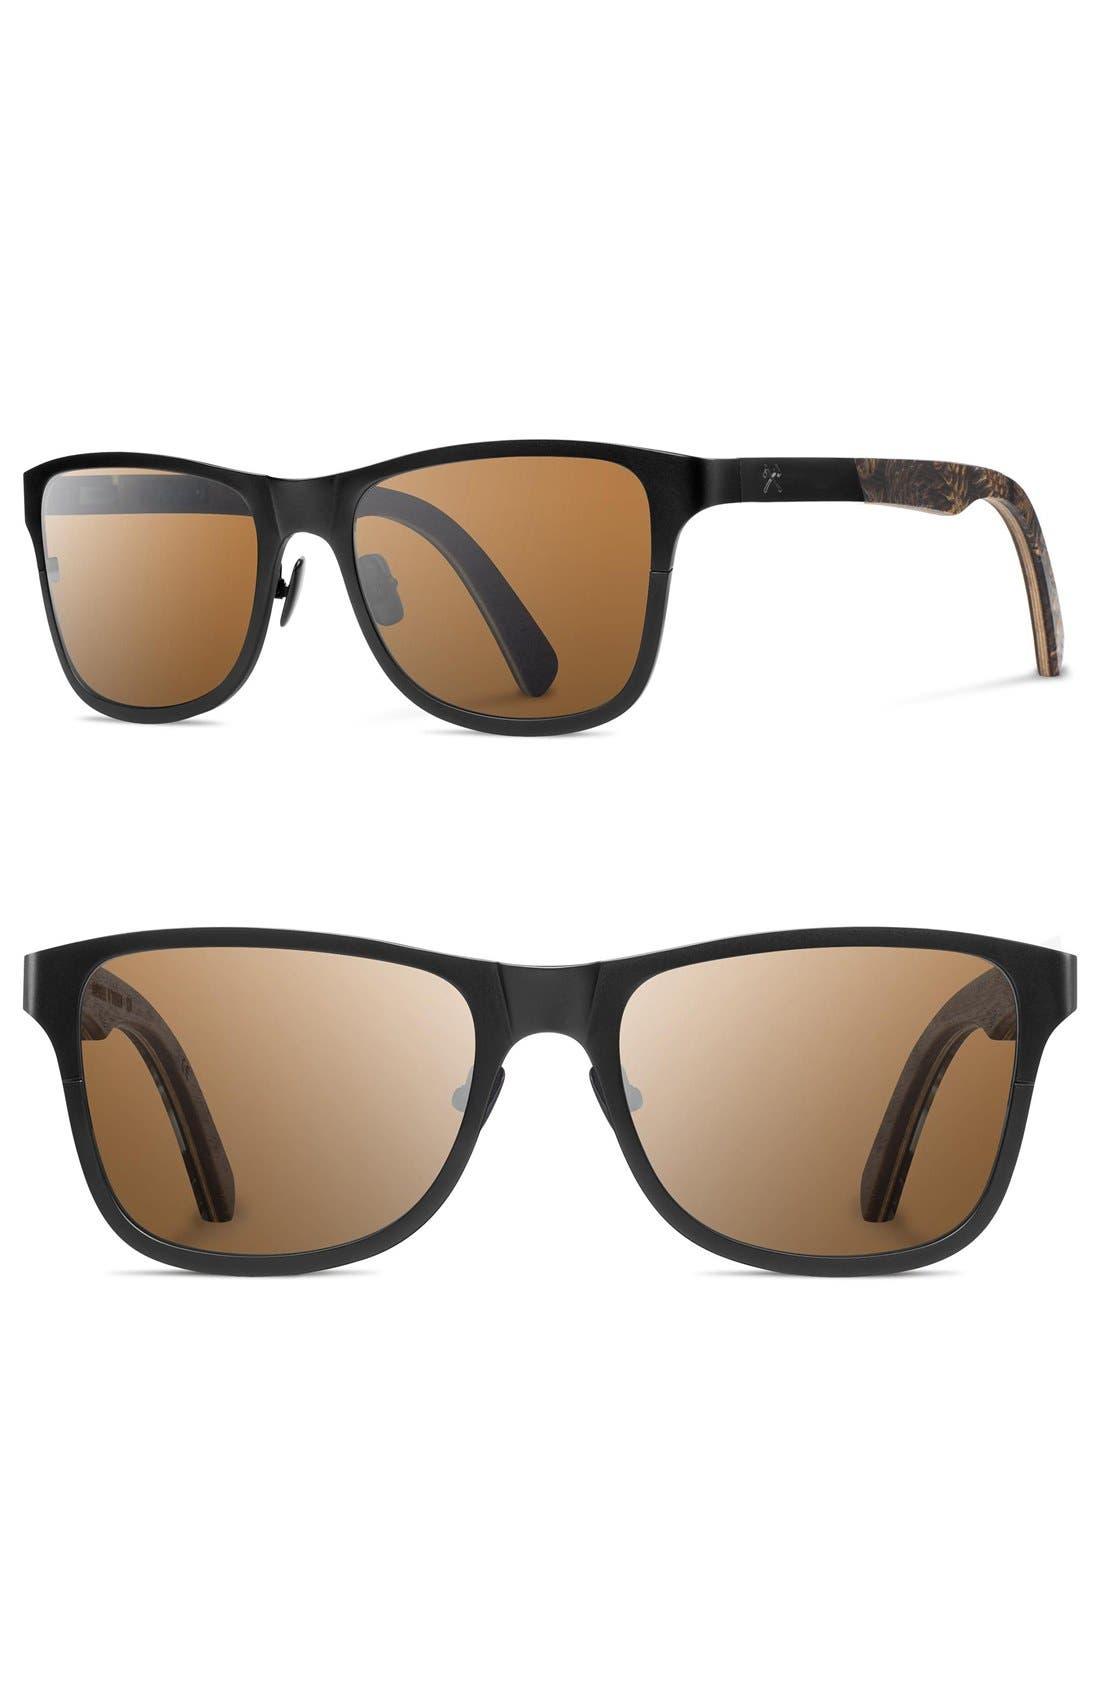 Canby 54mm Polarized Pine Cone & Titanium Sunglasses,                         Main,                         color, Black/ Pinecone/ Brown